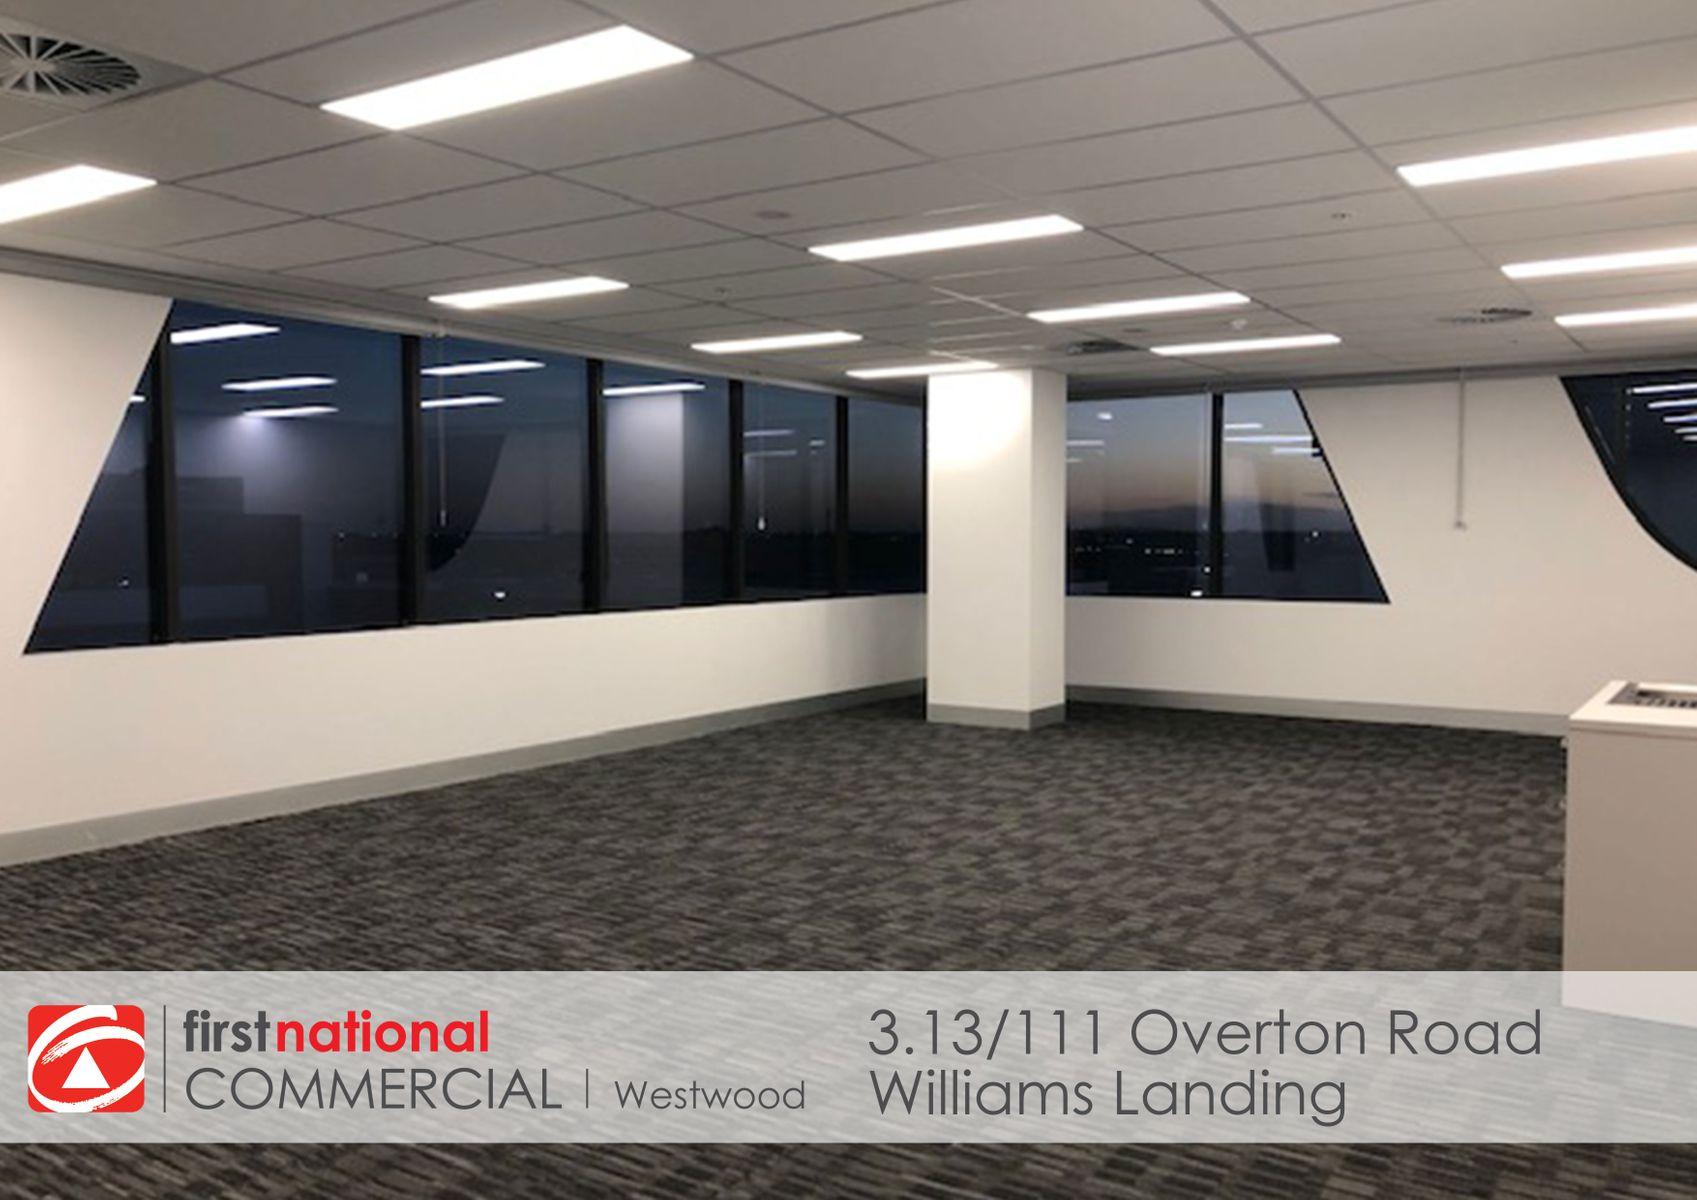 3.13/111 Overton Road, Williams Landing, VIC 3027